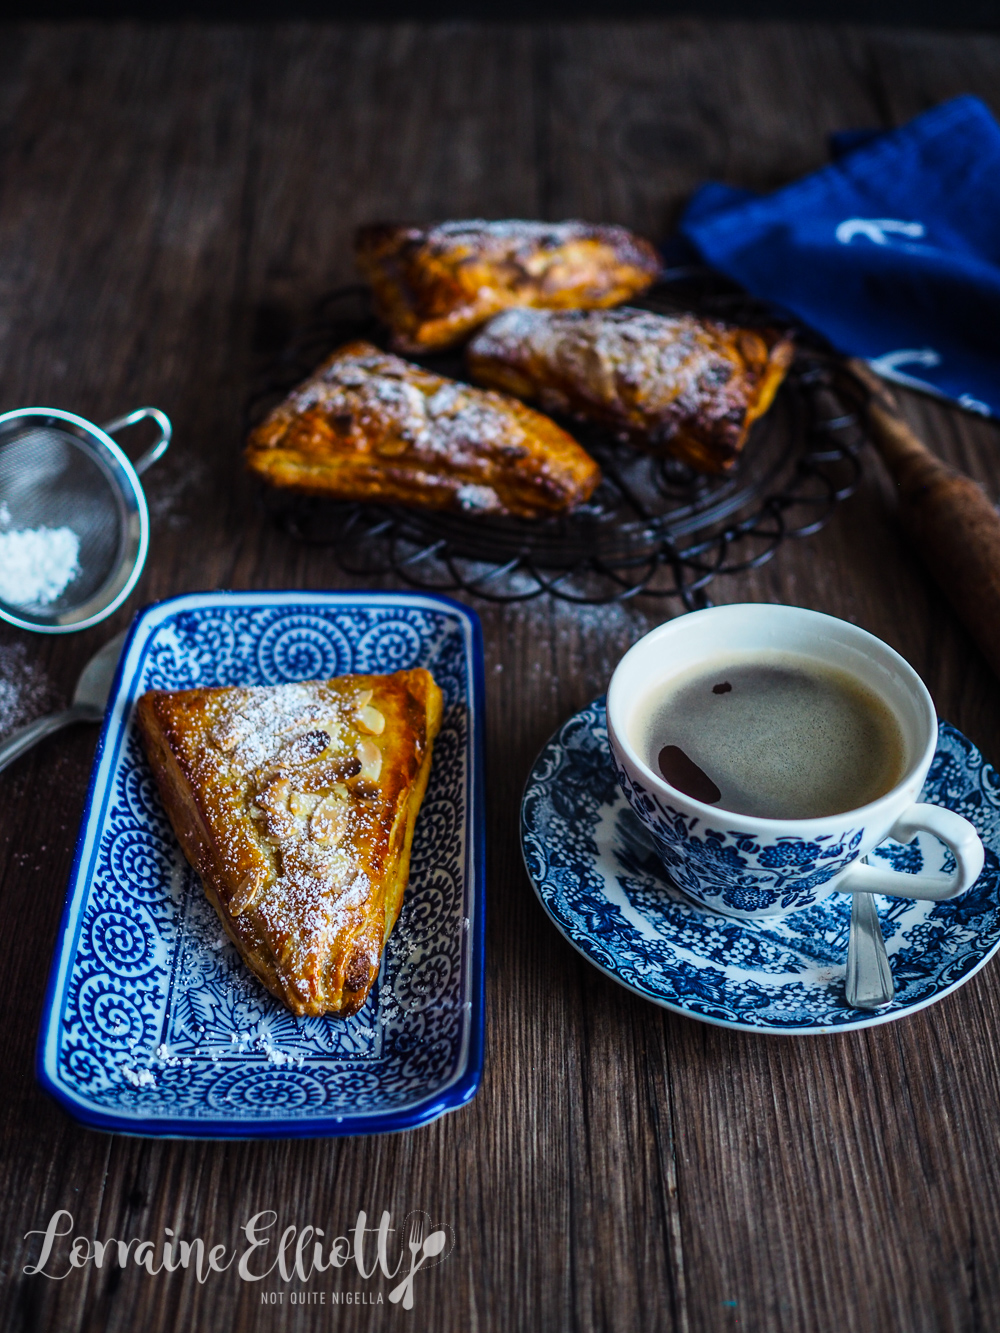 Jesuita Portuguese Pastry